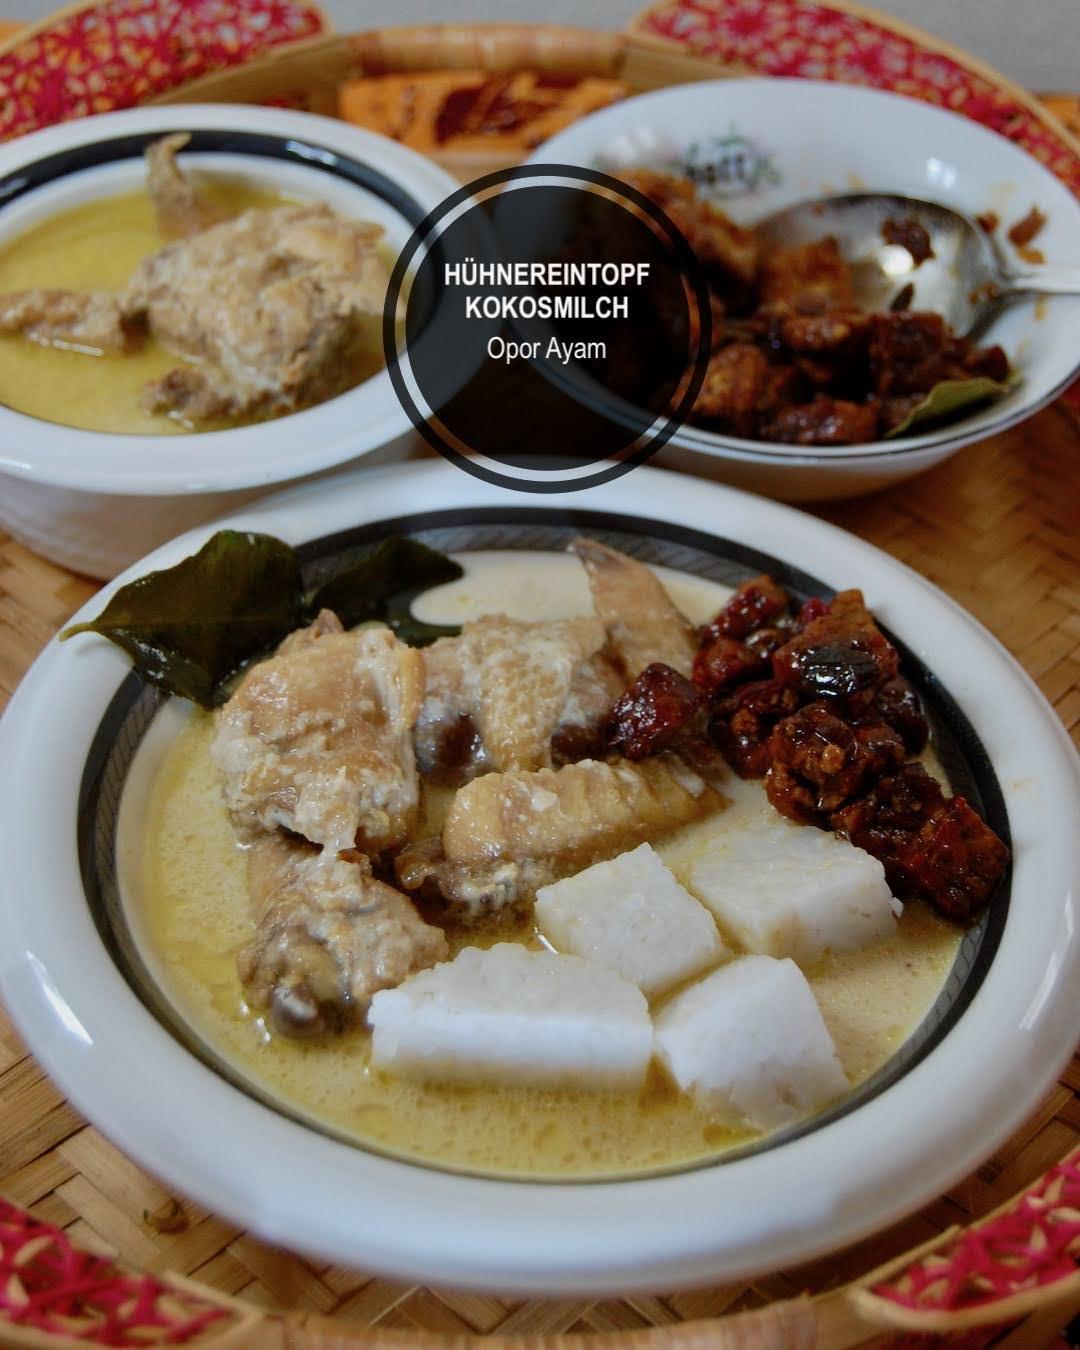 Rezept Opor Ayam, Hühnereintopf mit Kokosmilch balinesisch